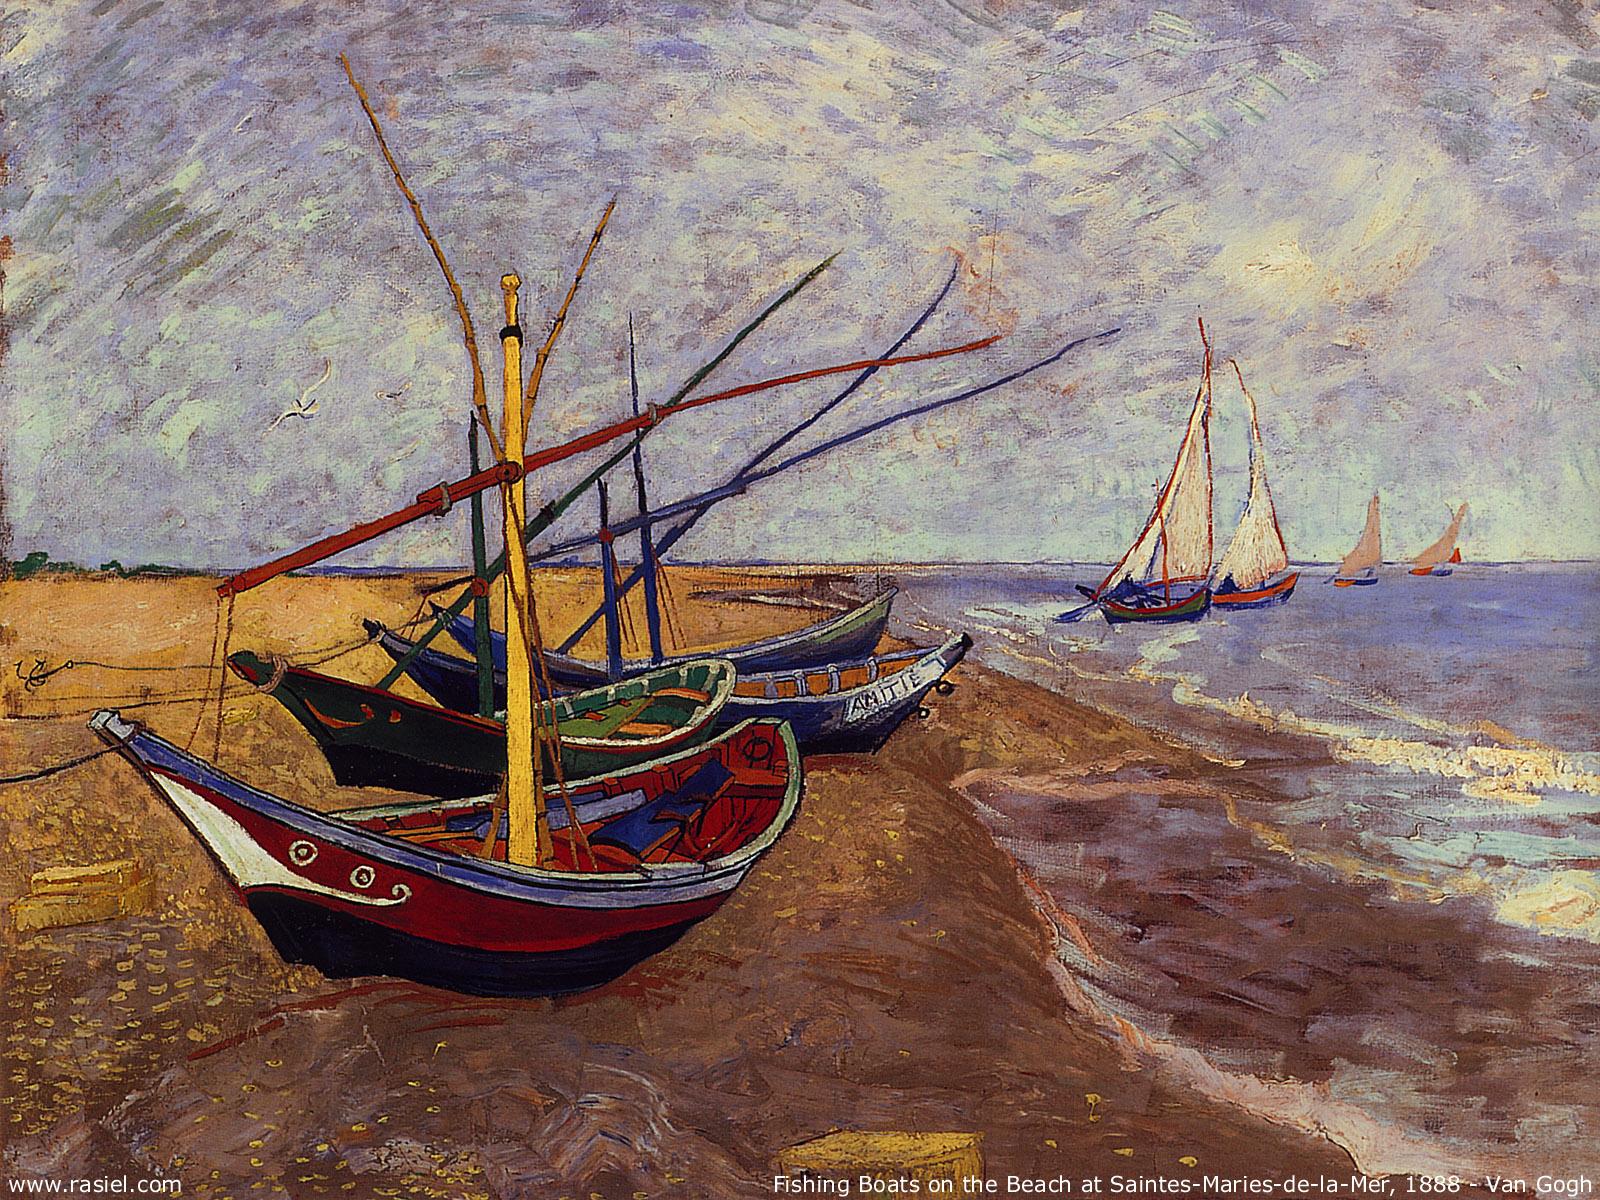 Wallpapers Photo Art: Vincent van Gogh Wallpaper, Gogh Painting Art ...